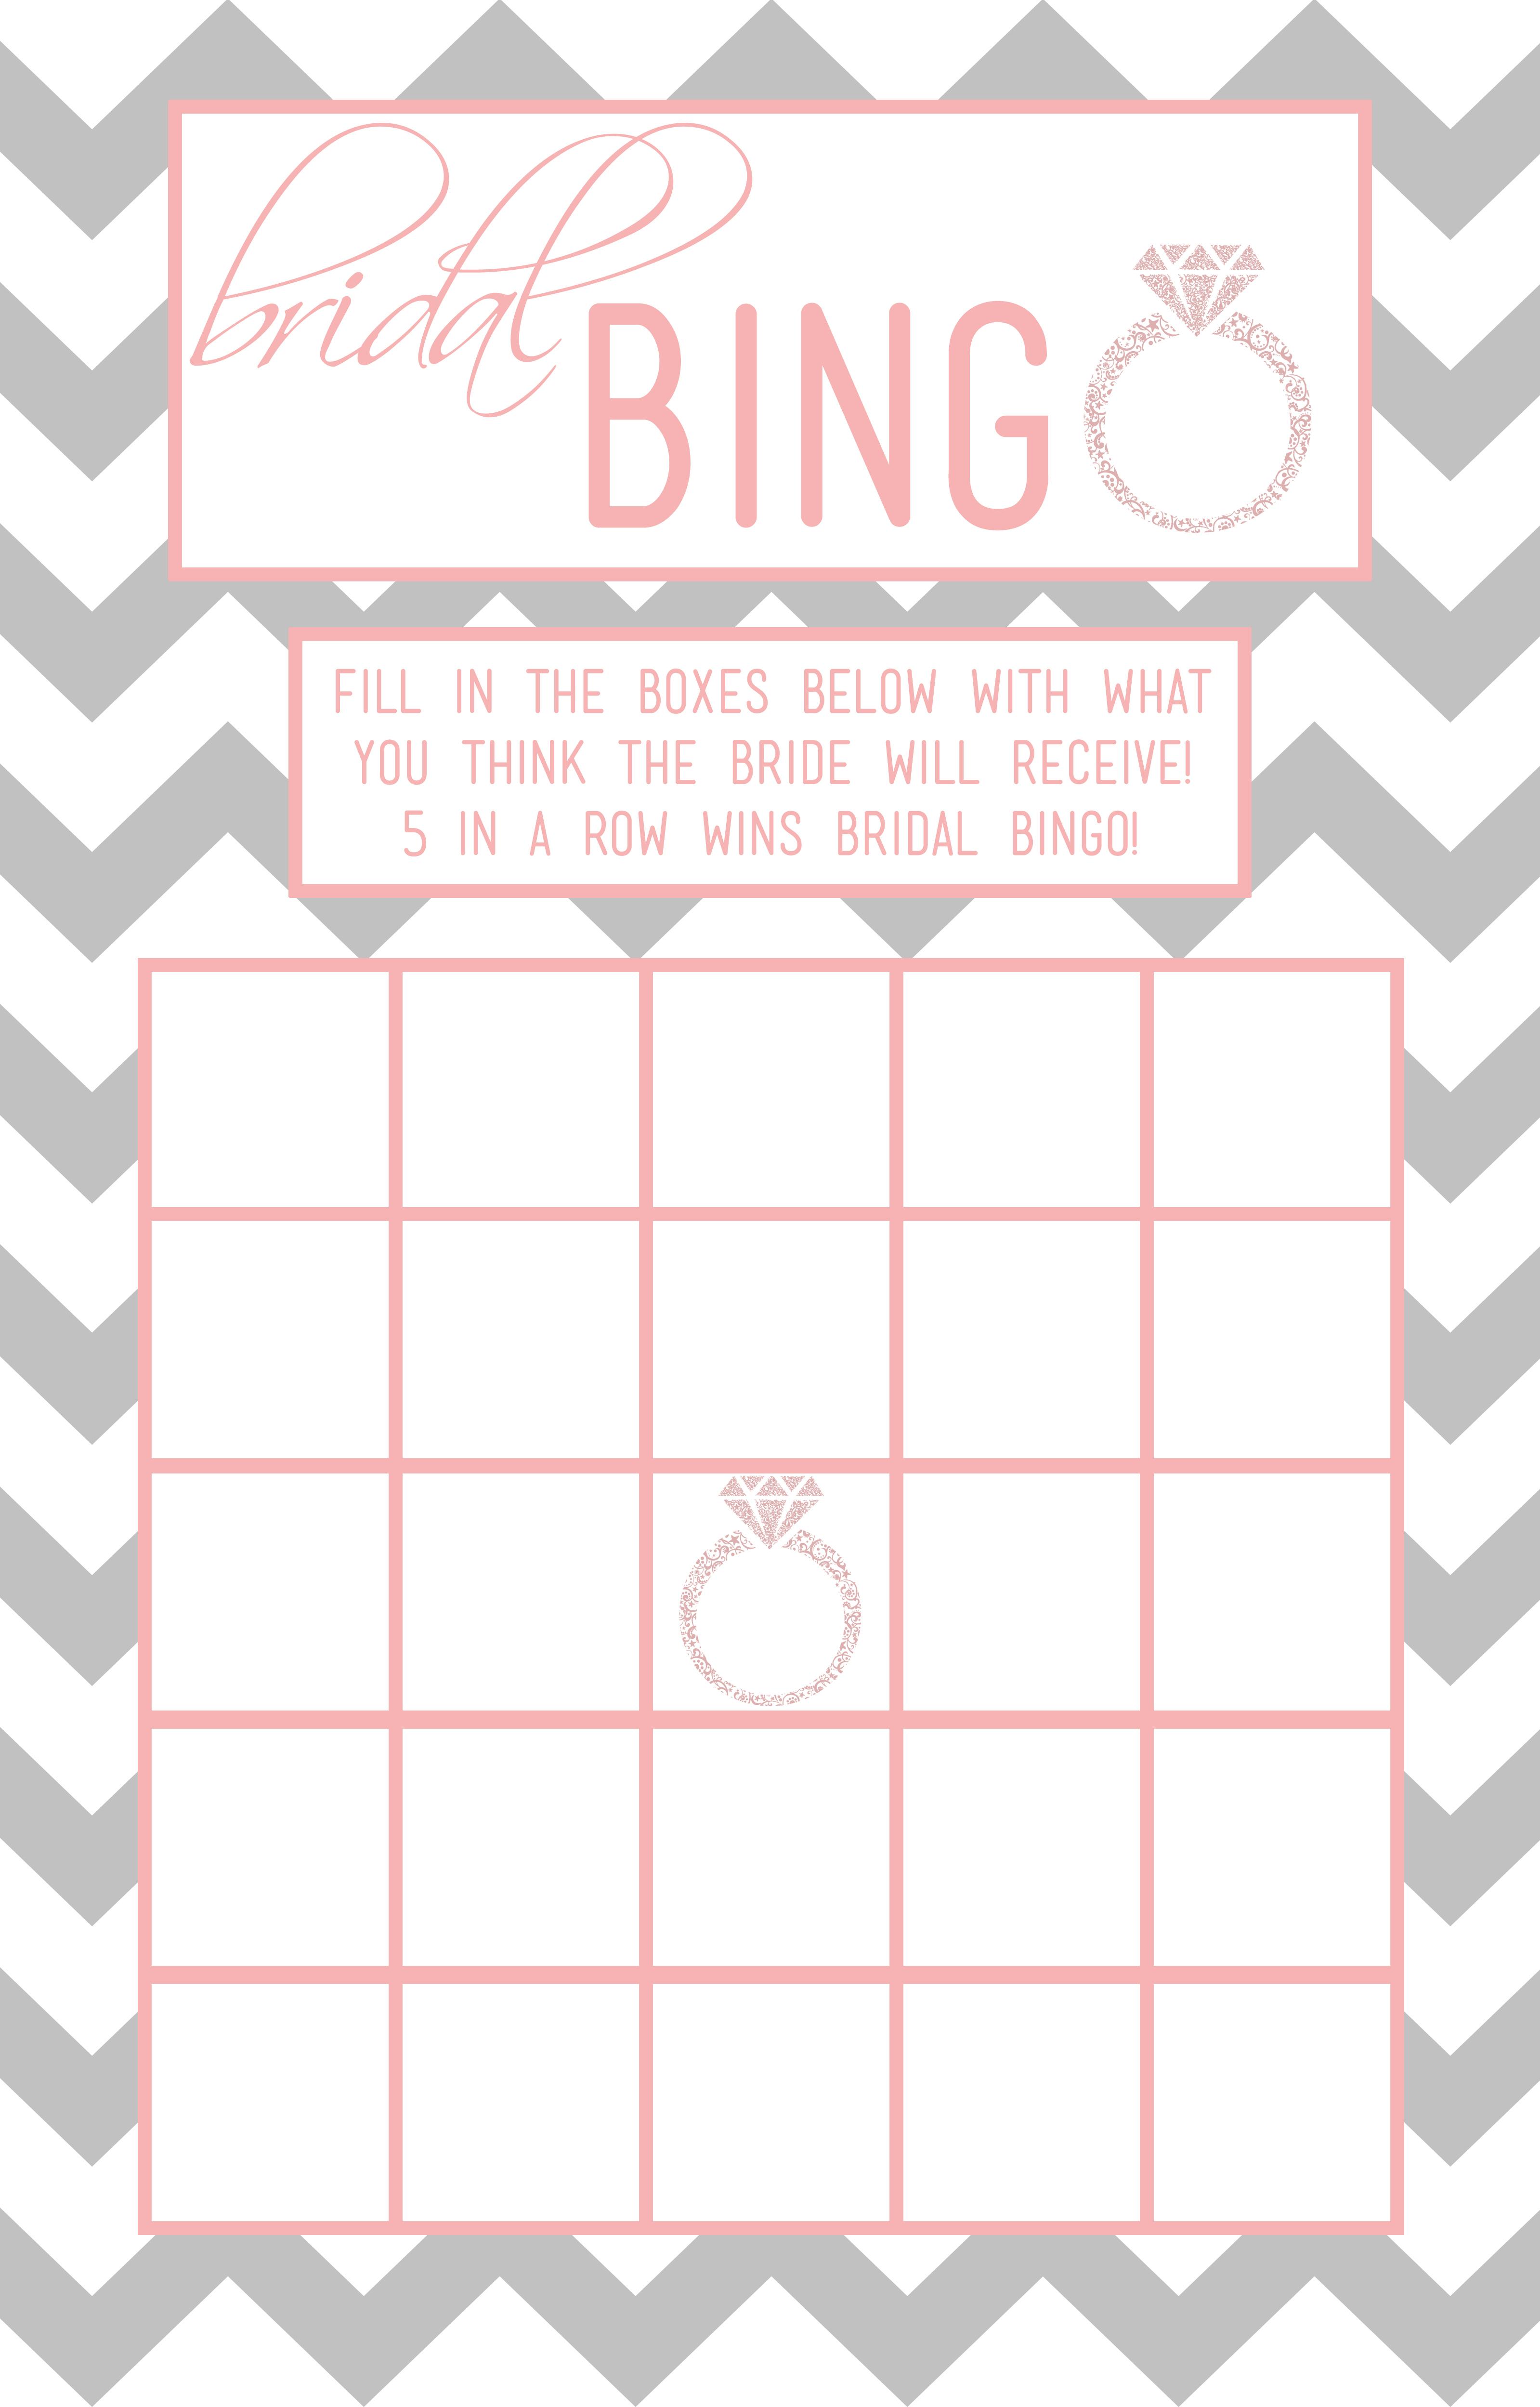 30 Images Of Template For Wedding Shower Bingo   Helmettown - Free Printable Bridal Shower Blank Bingo Games